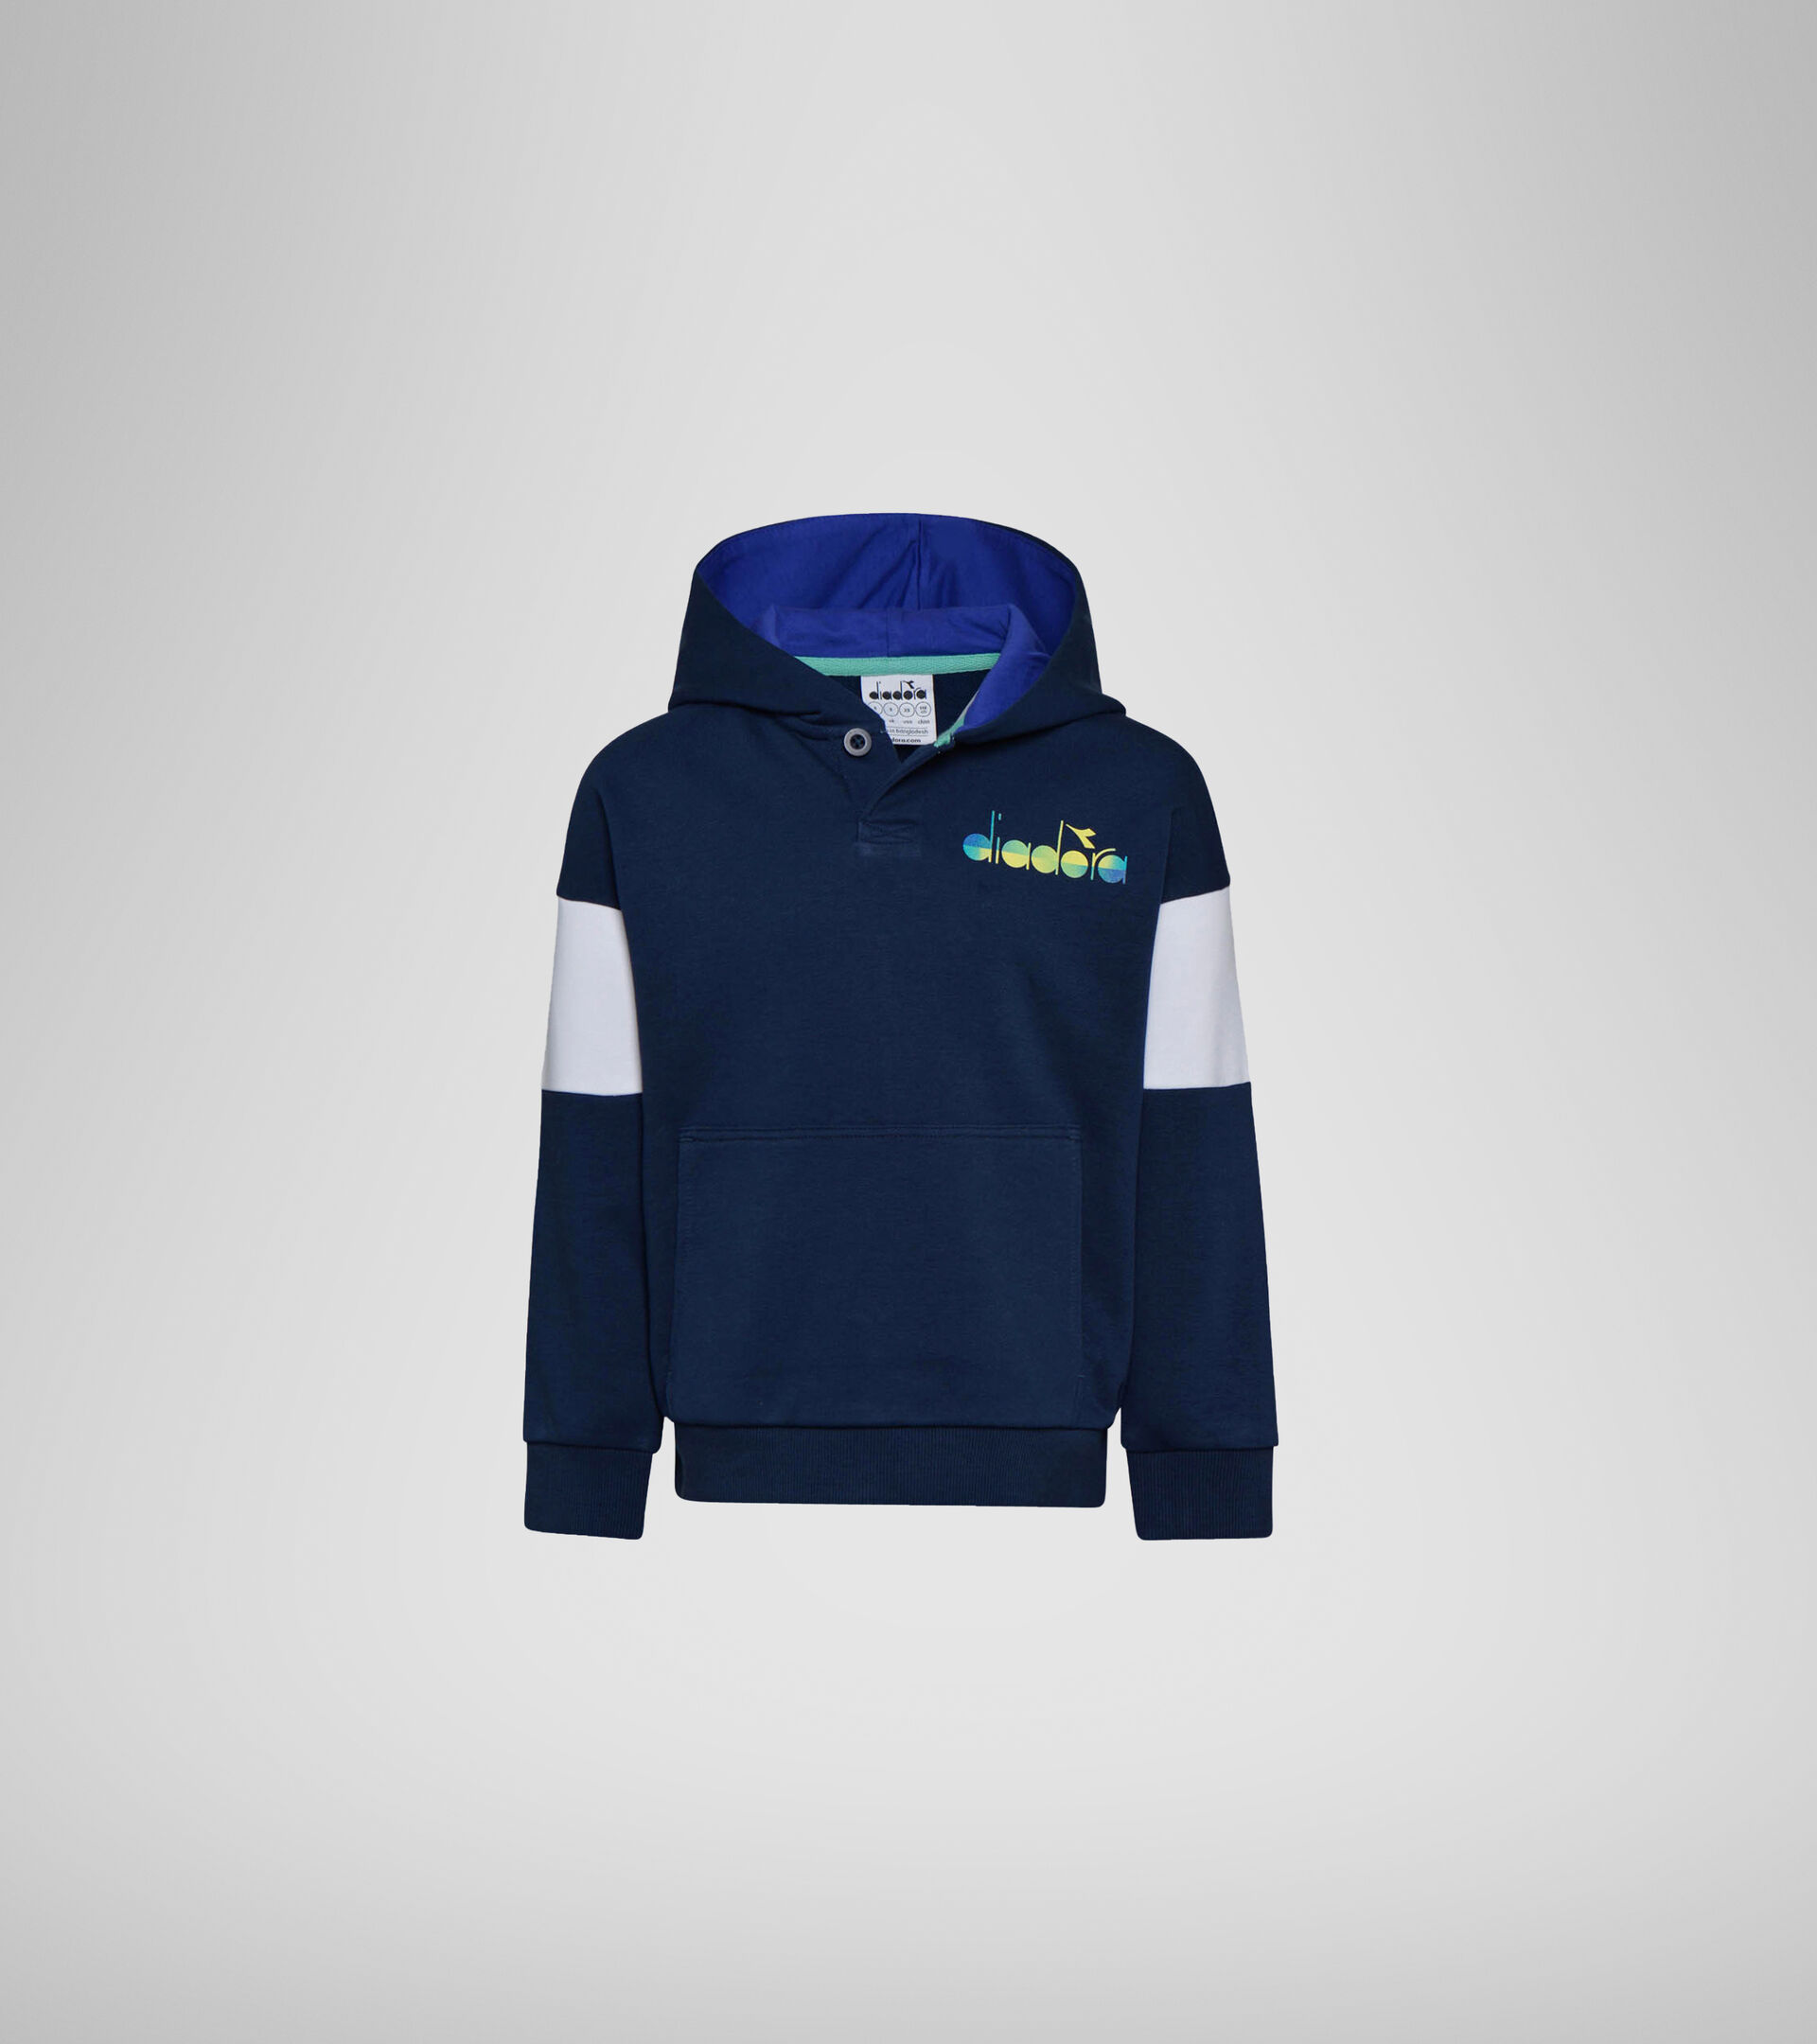 Hooded sweatshirt - Boys JB. HOODIE DIADORA CLUB BLUE CORSAIR - Diadora